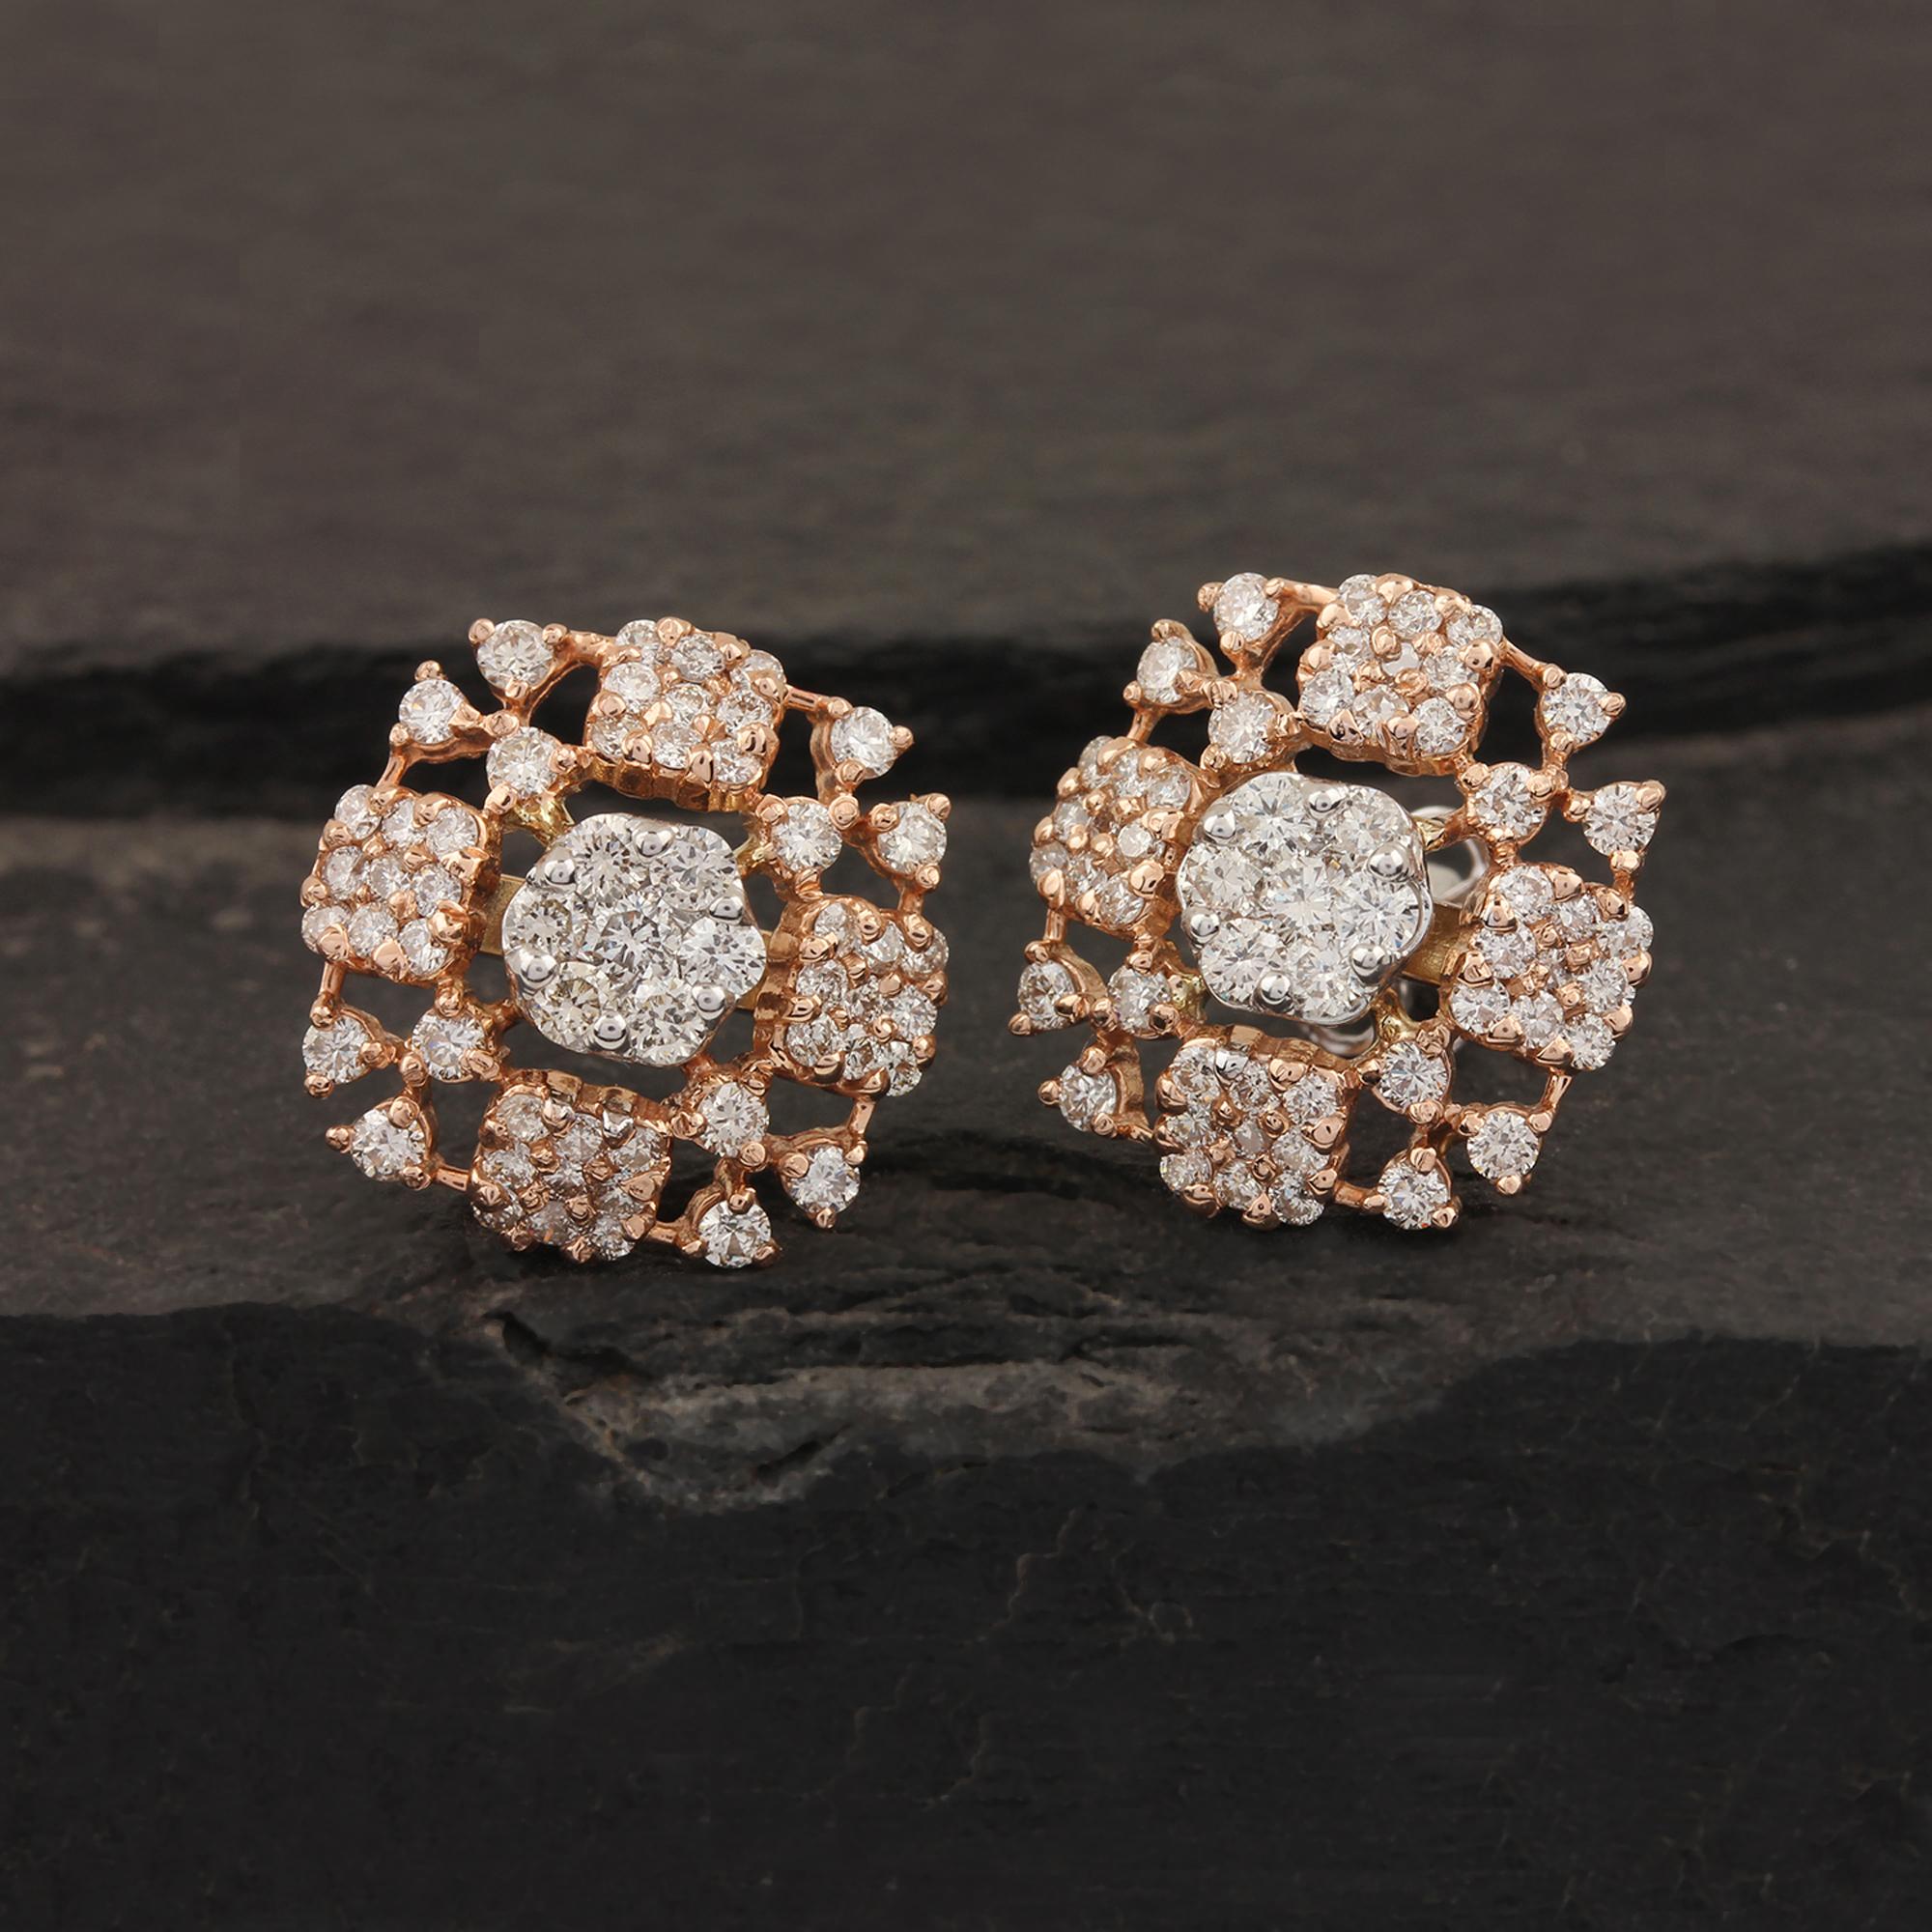 14k Gold Genuine Diamond Earrings